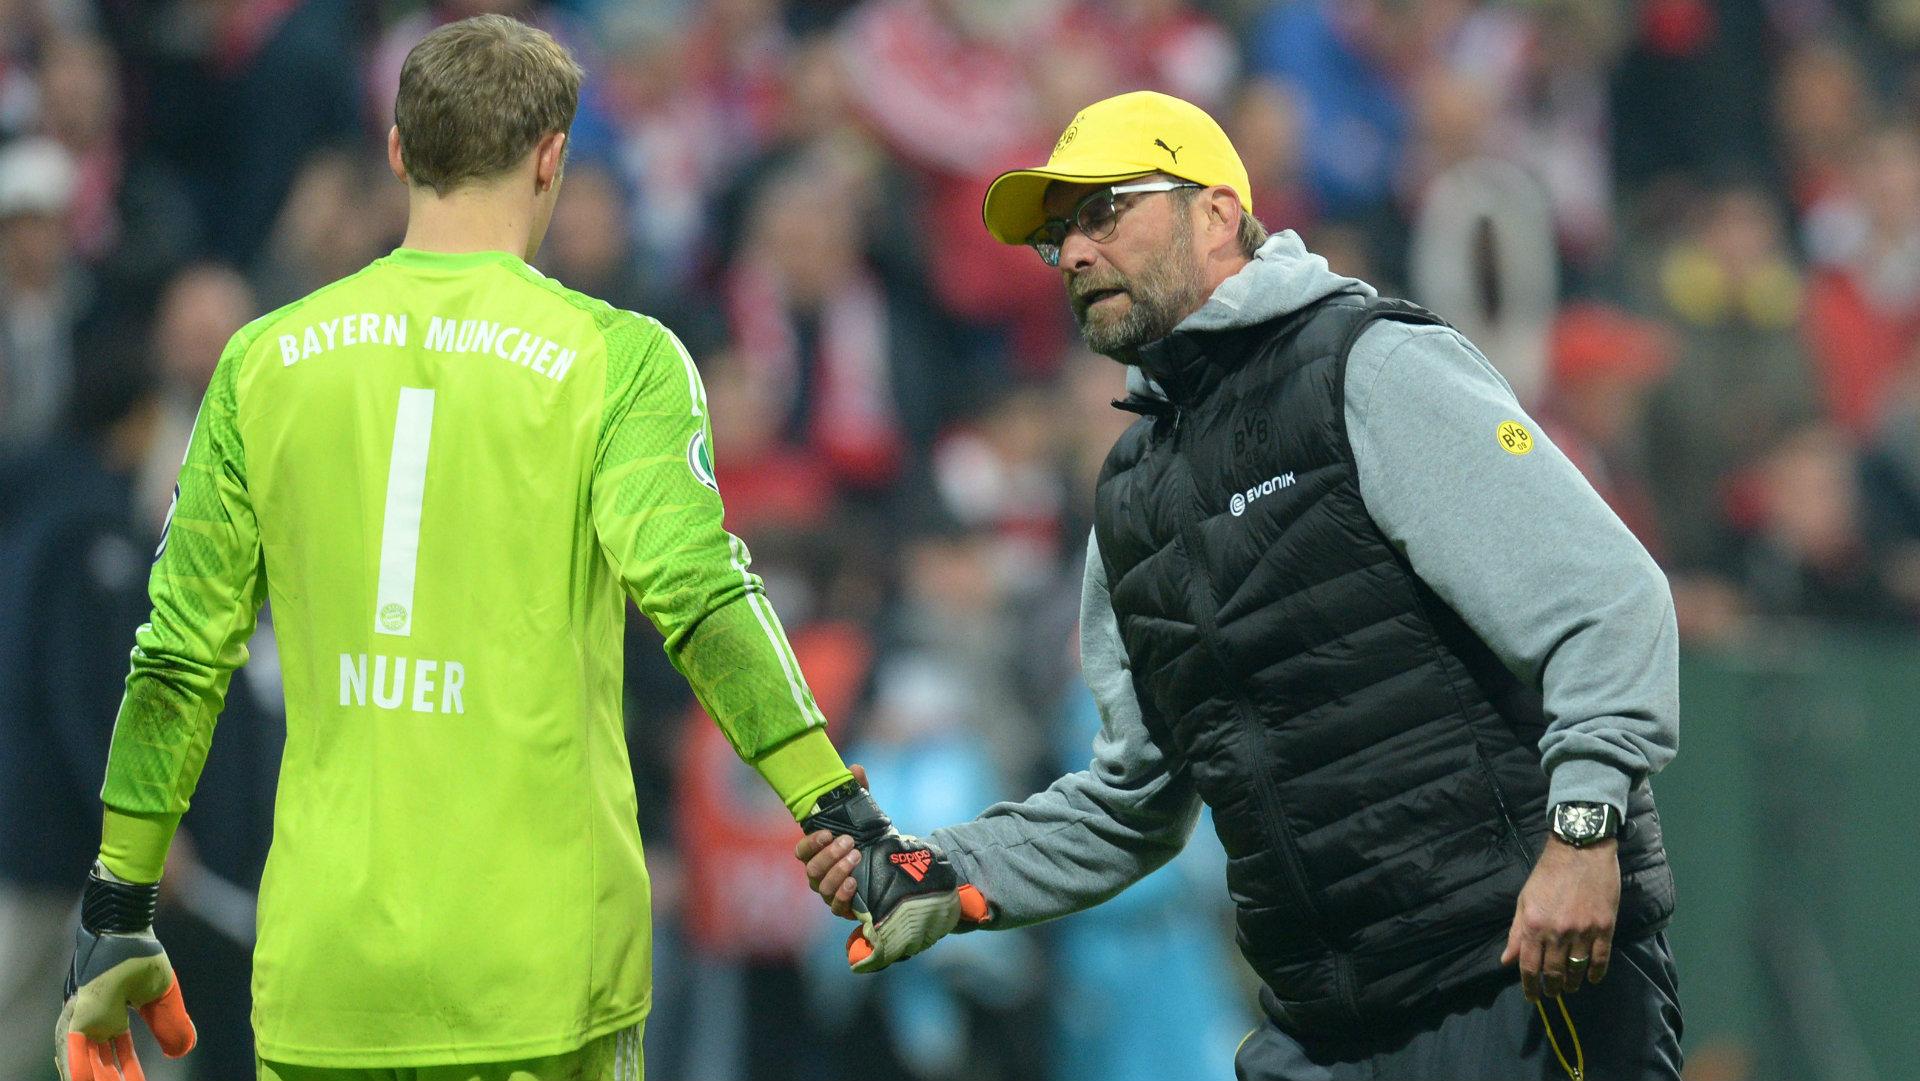 Quality won UEFA Champions League for Bayern Munich, Klopp says